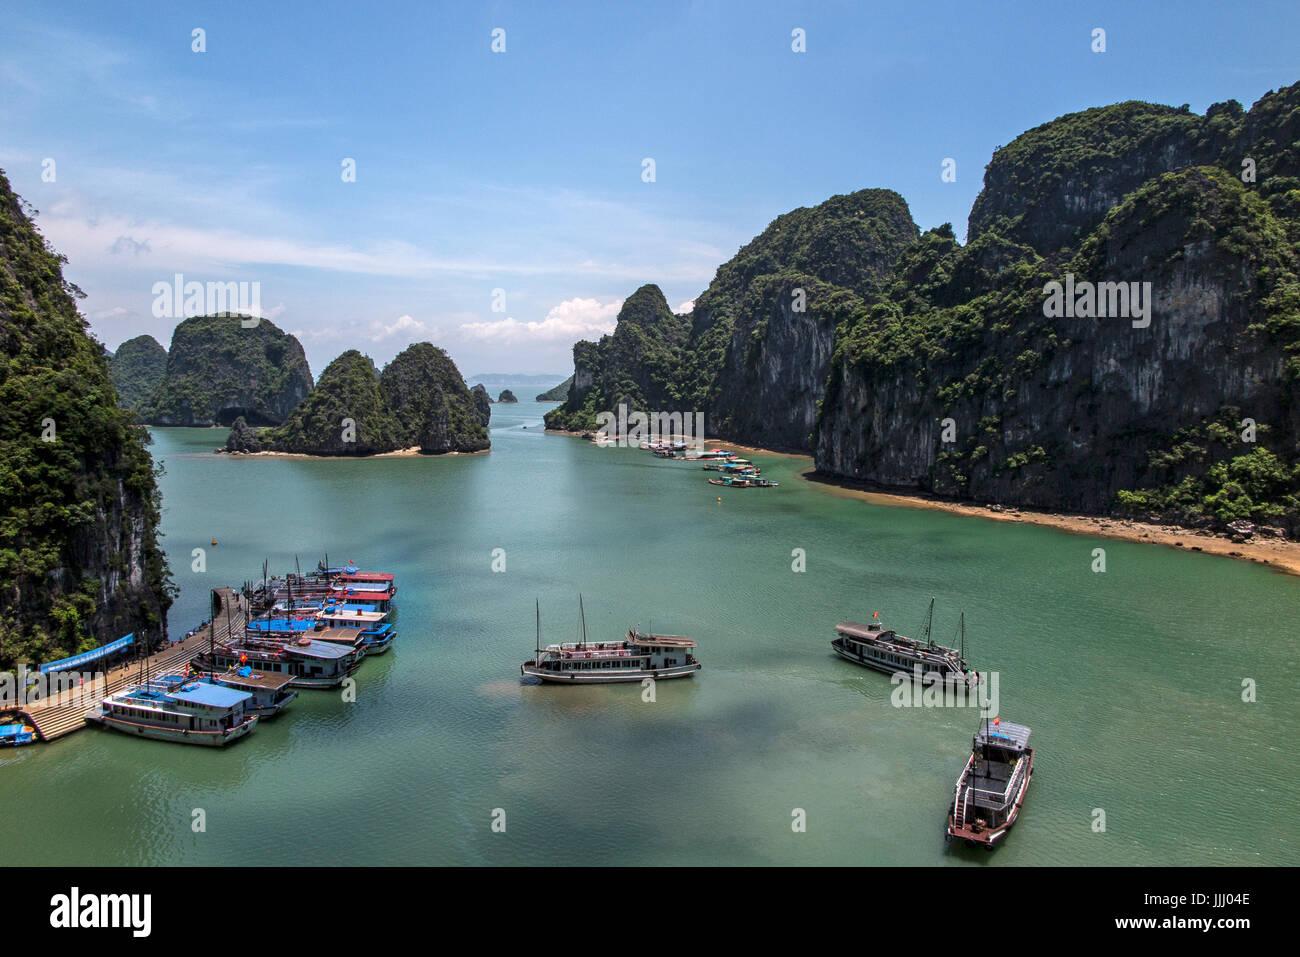 Scenic view of Halong Bay Vietnam. Stock Photo